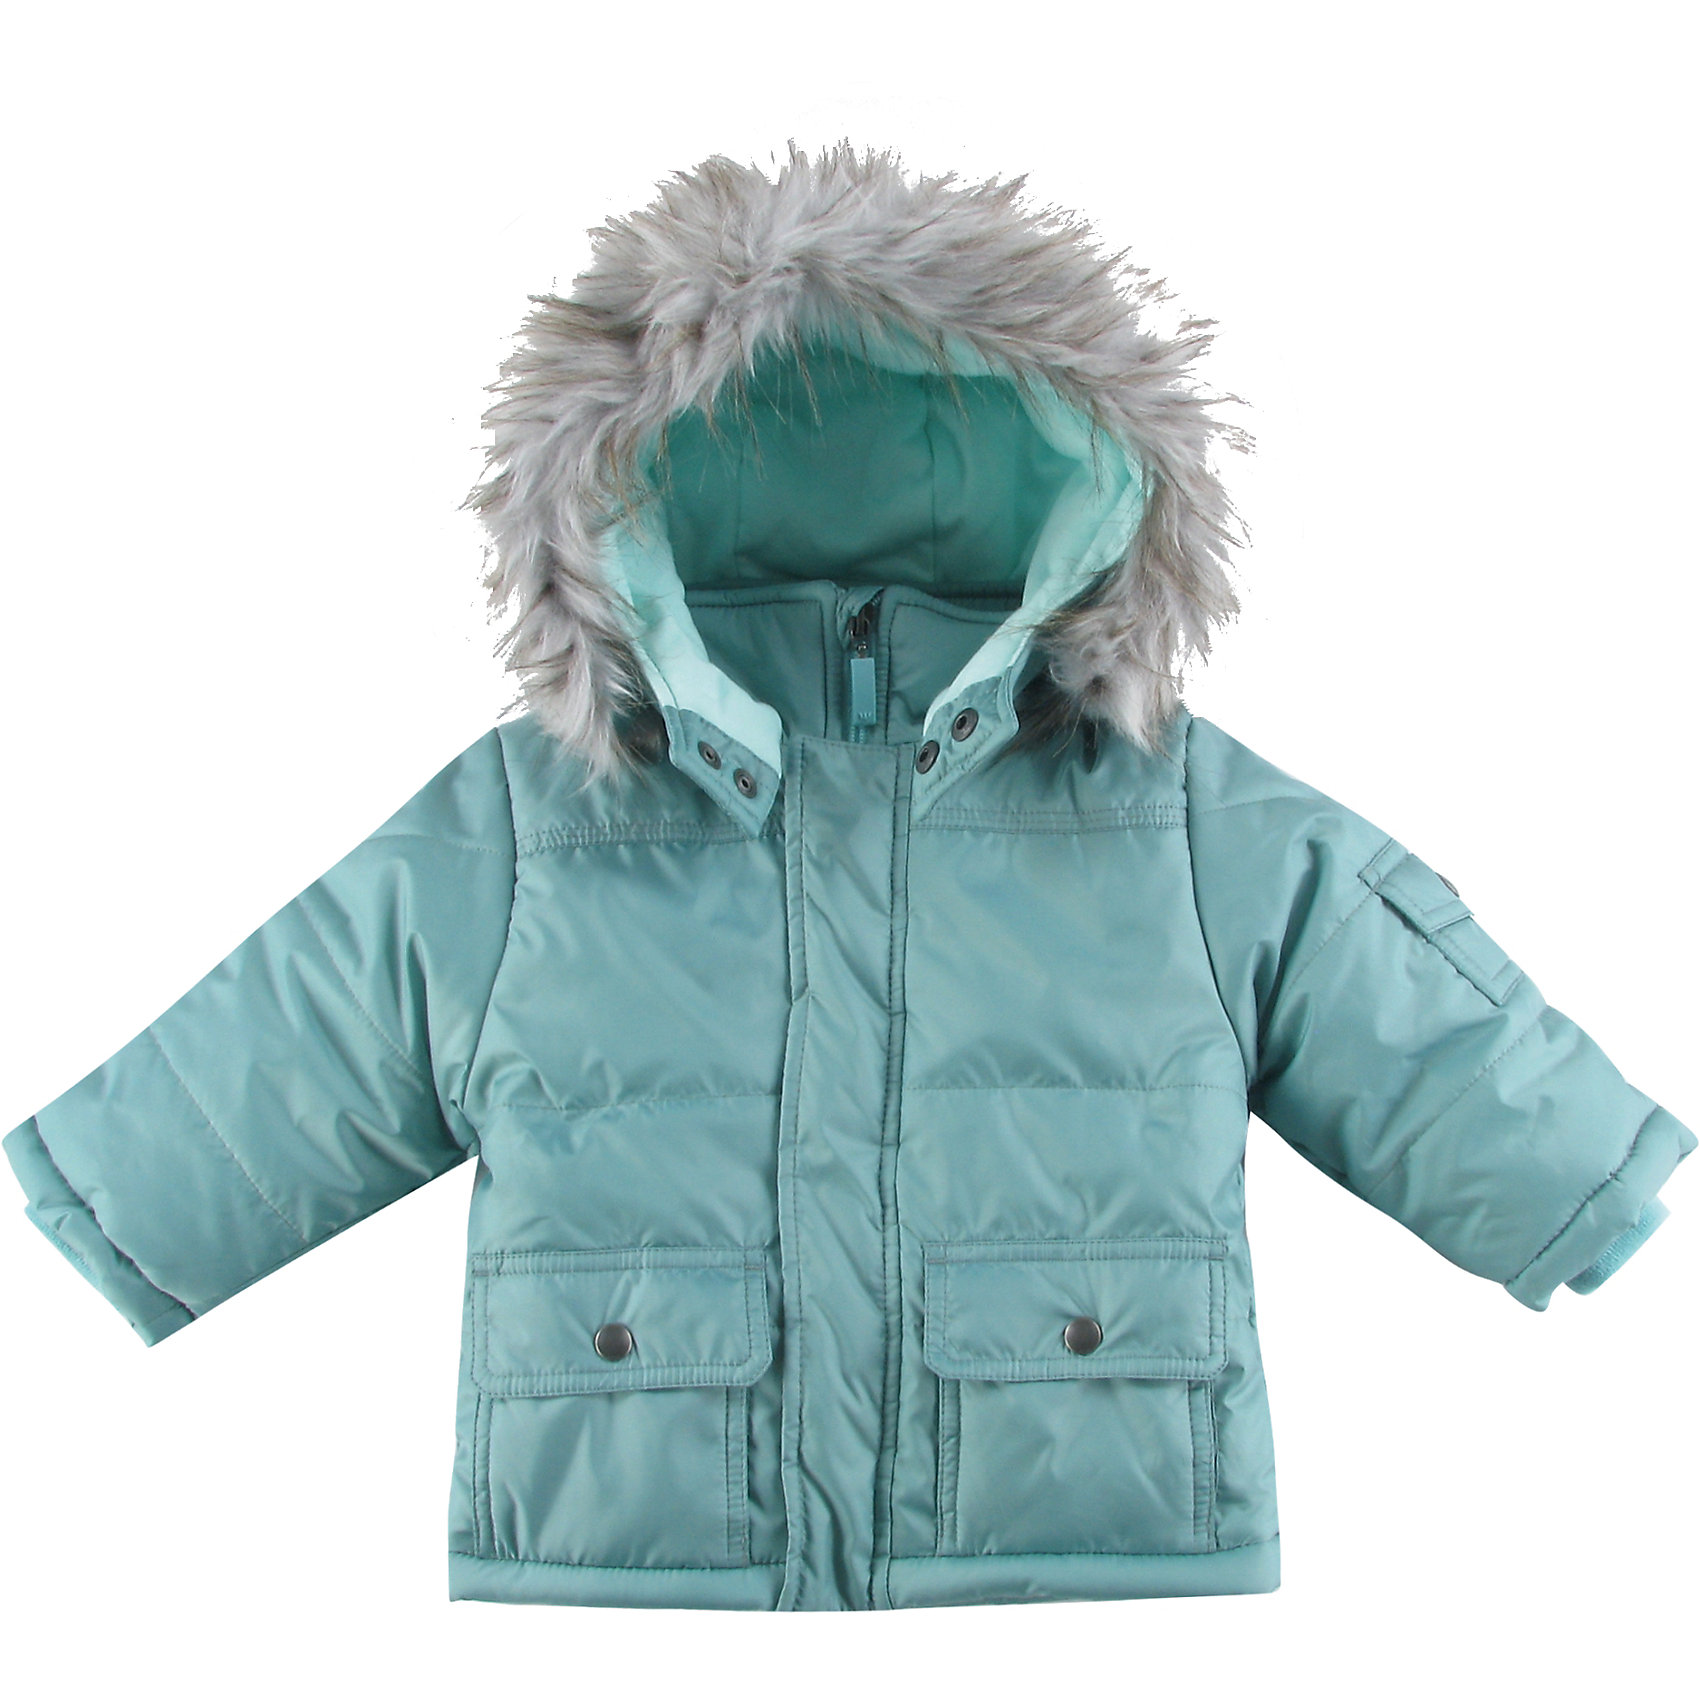 Куртка утепленная для мальчика WojcikВерхняя одежда<br>Куртка утепленная для мальчика Wojcik<br>Состав:<br>Полиэстер 100%<br><br>Ширина мм: 356<br>Глубина мм: 10<br>Высота мм: 245<br>Вес г: 519<br>Цвет: зеленый<br>Возраст от месяцев: 6<br>Возраст до месяцев: 9<br>Пол: Мужской<br>Возраст: Детский<br>Размер: 74,98,92,80,86<br>SKU: 5591891